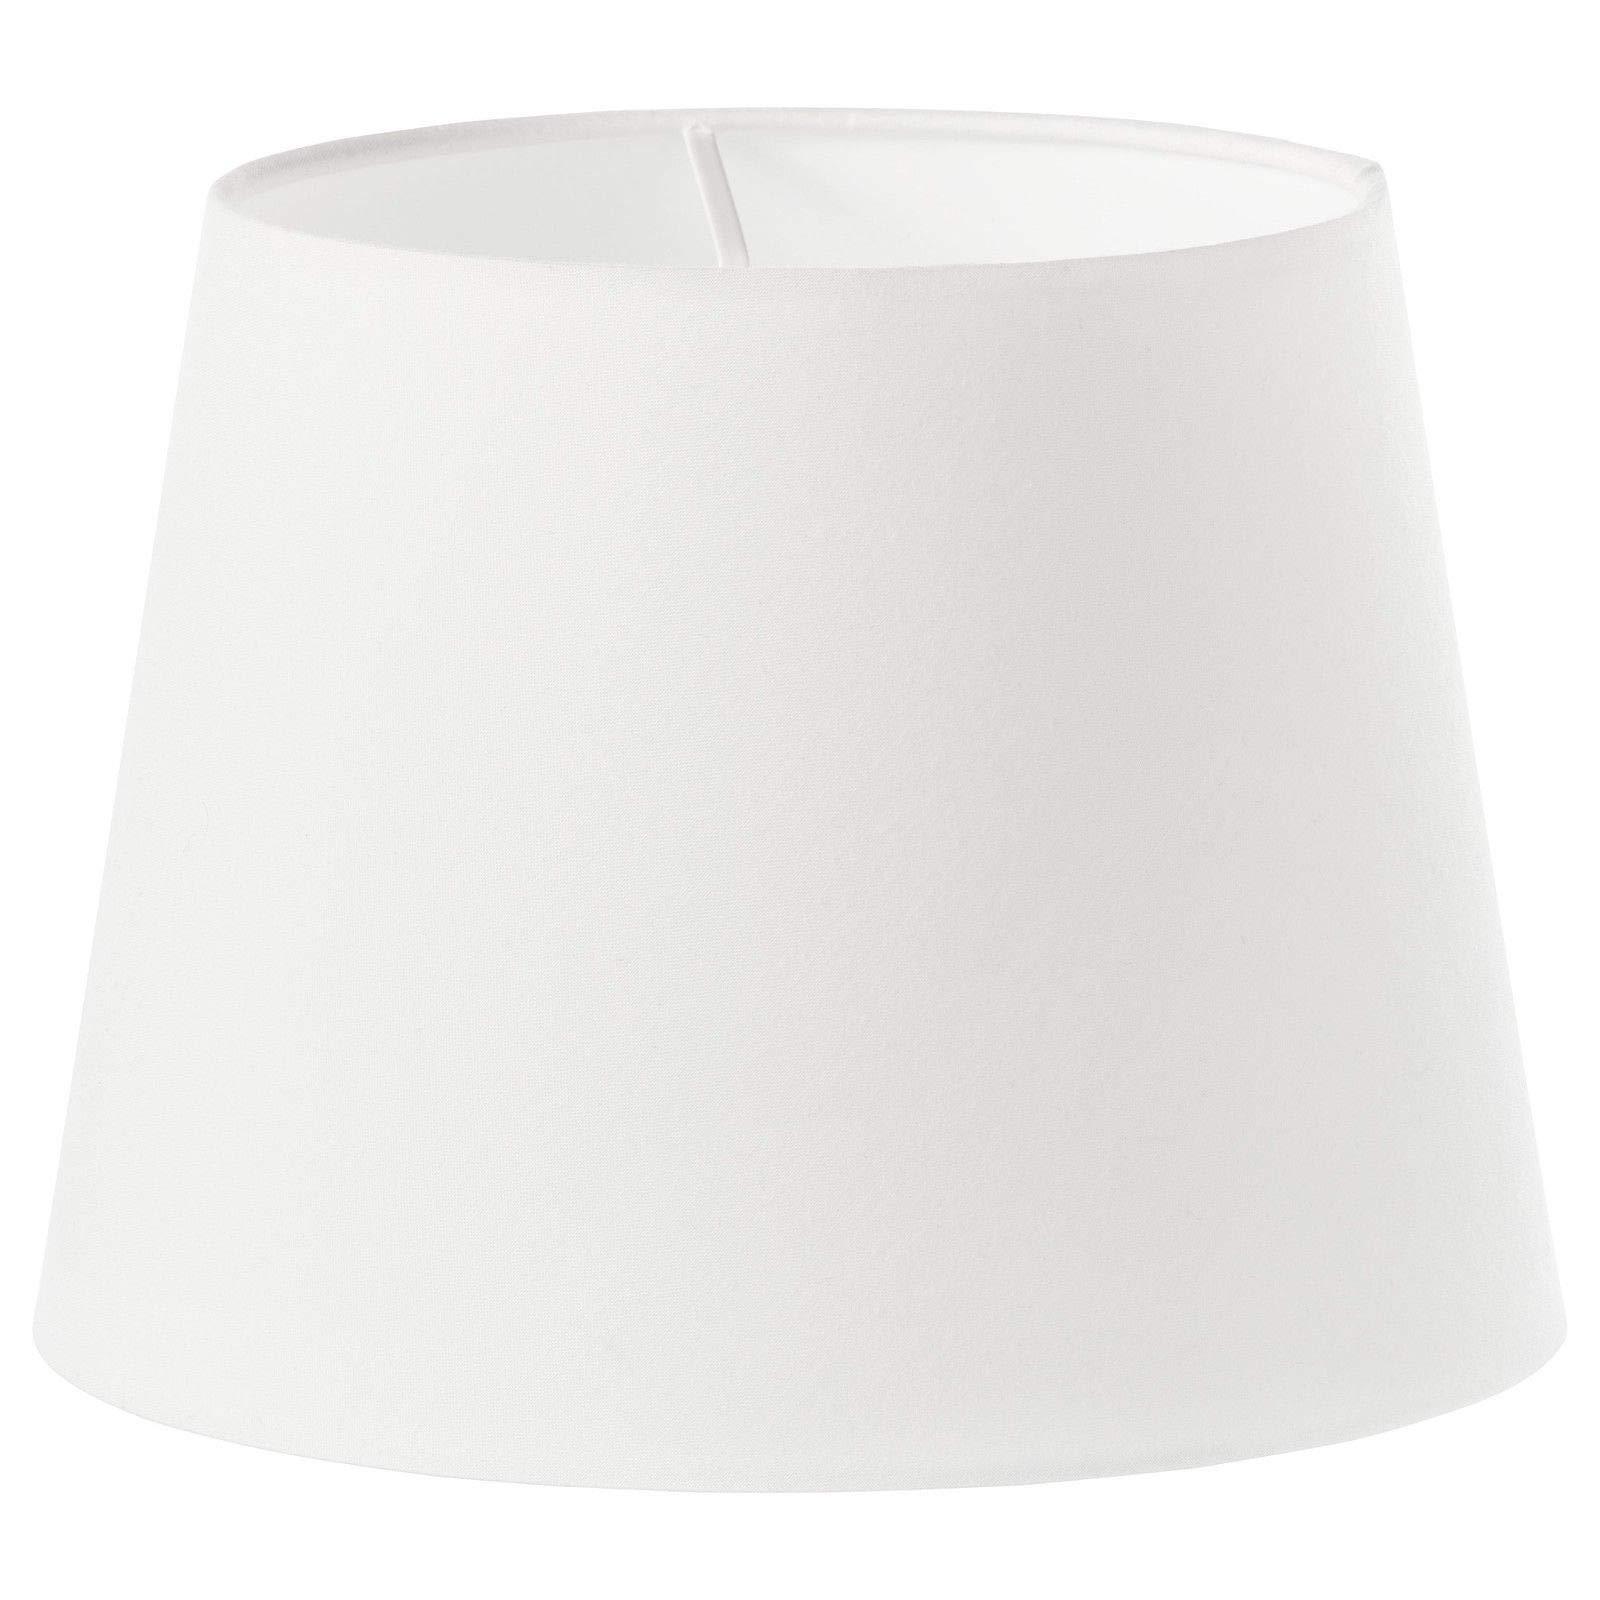 Kanstar Lamp Shade 8.5''x12''x8.5'' (Linen White)